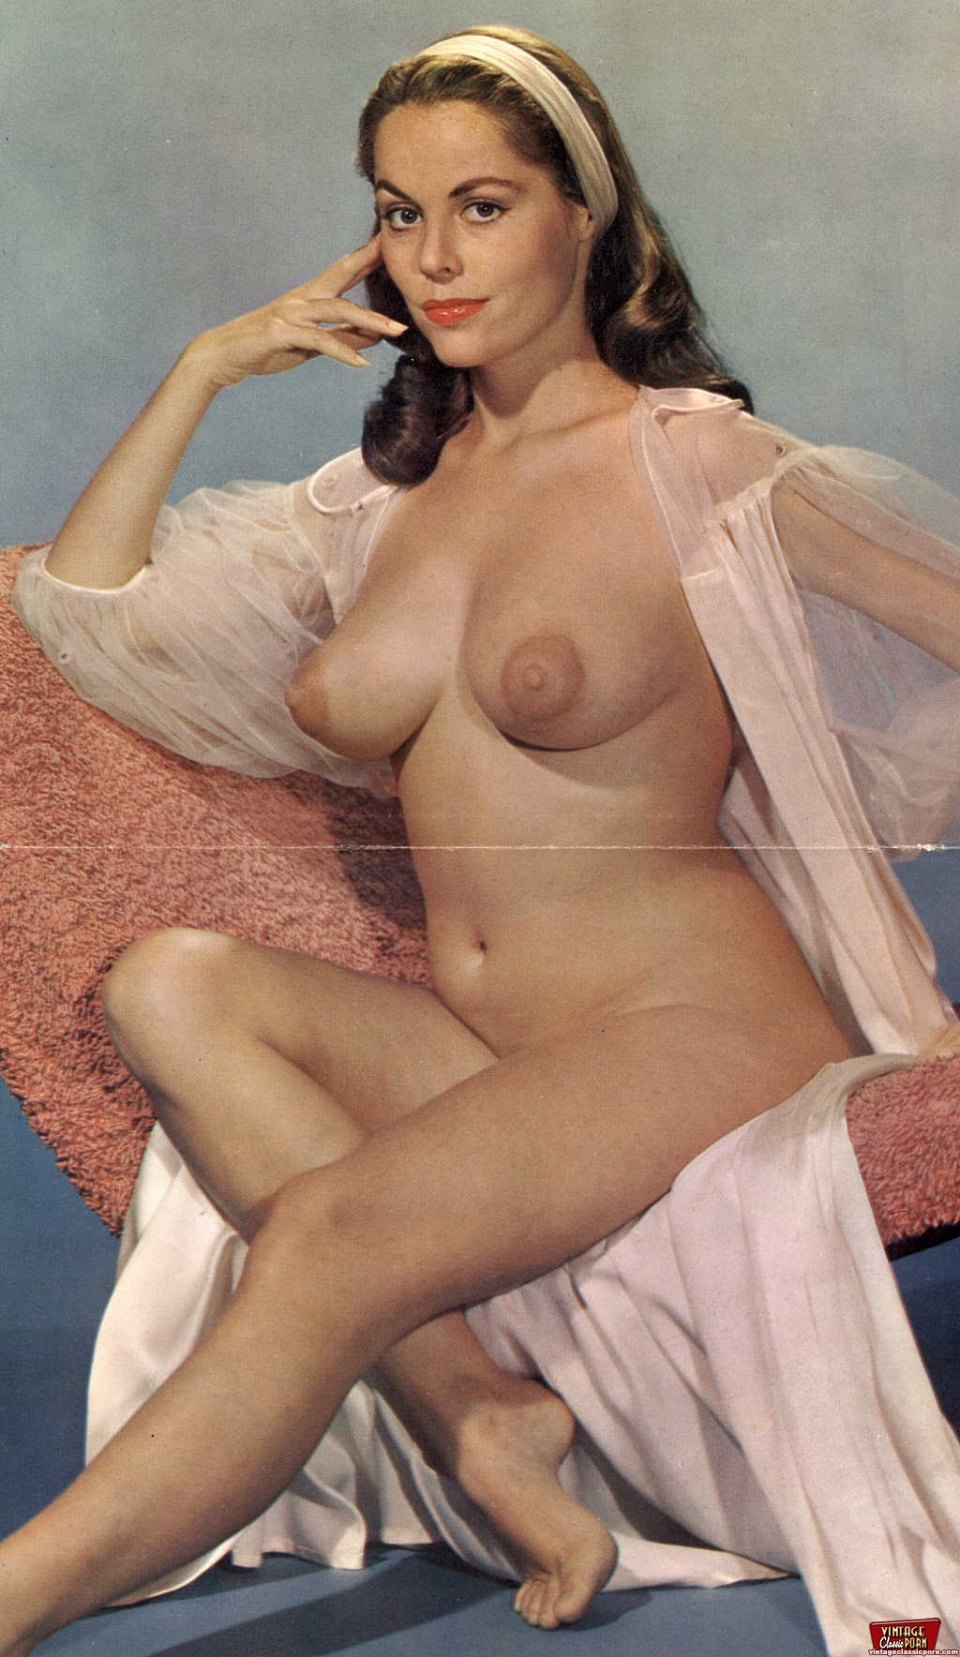 nudist family magazines page 3 jung und frei nudist